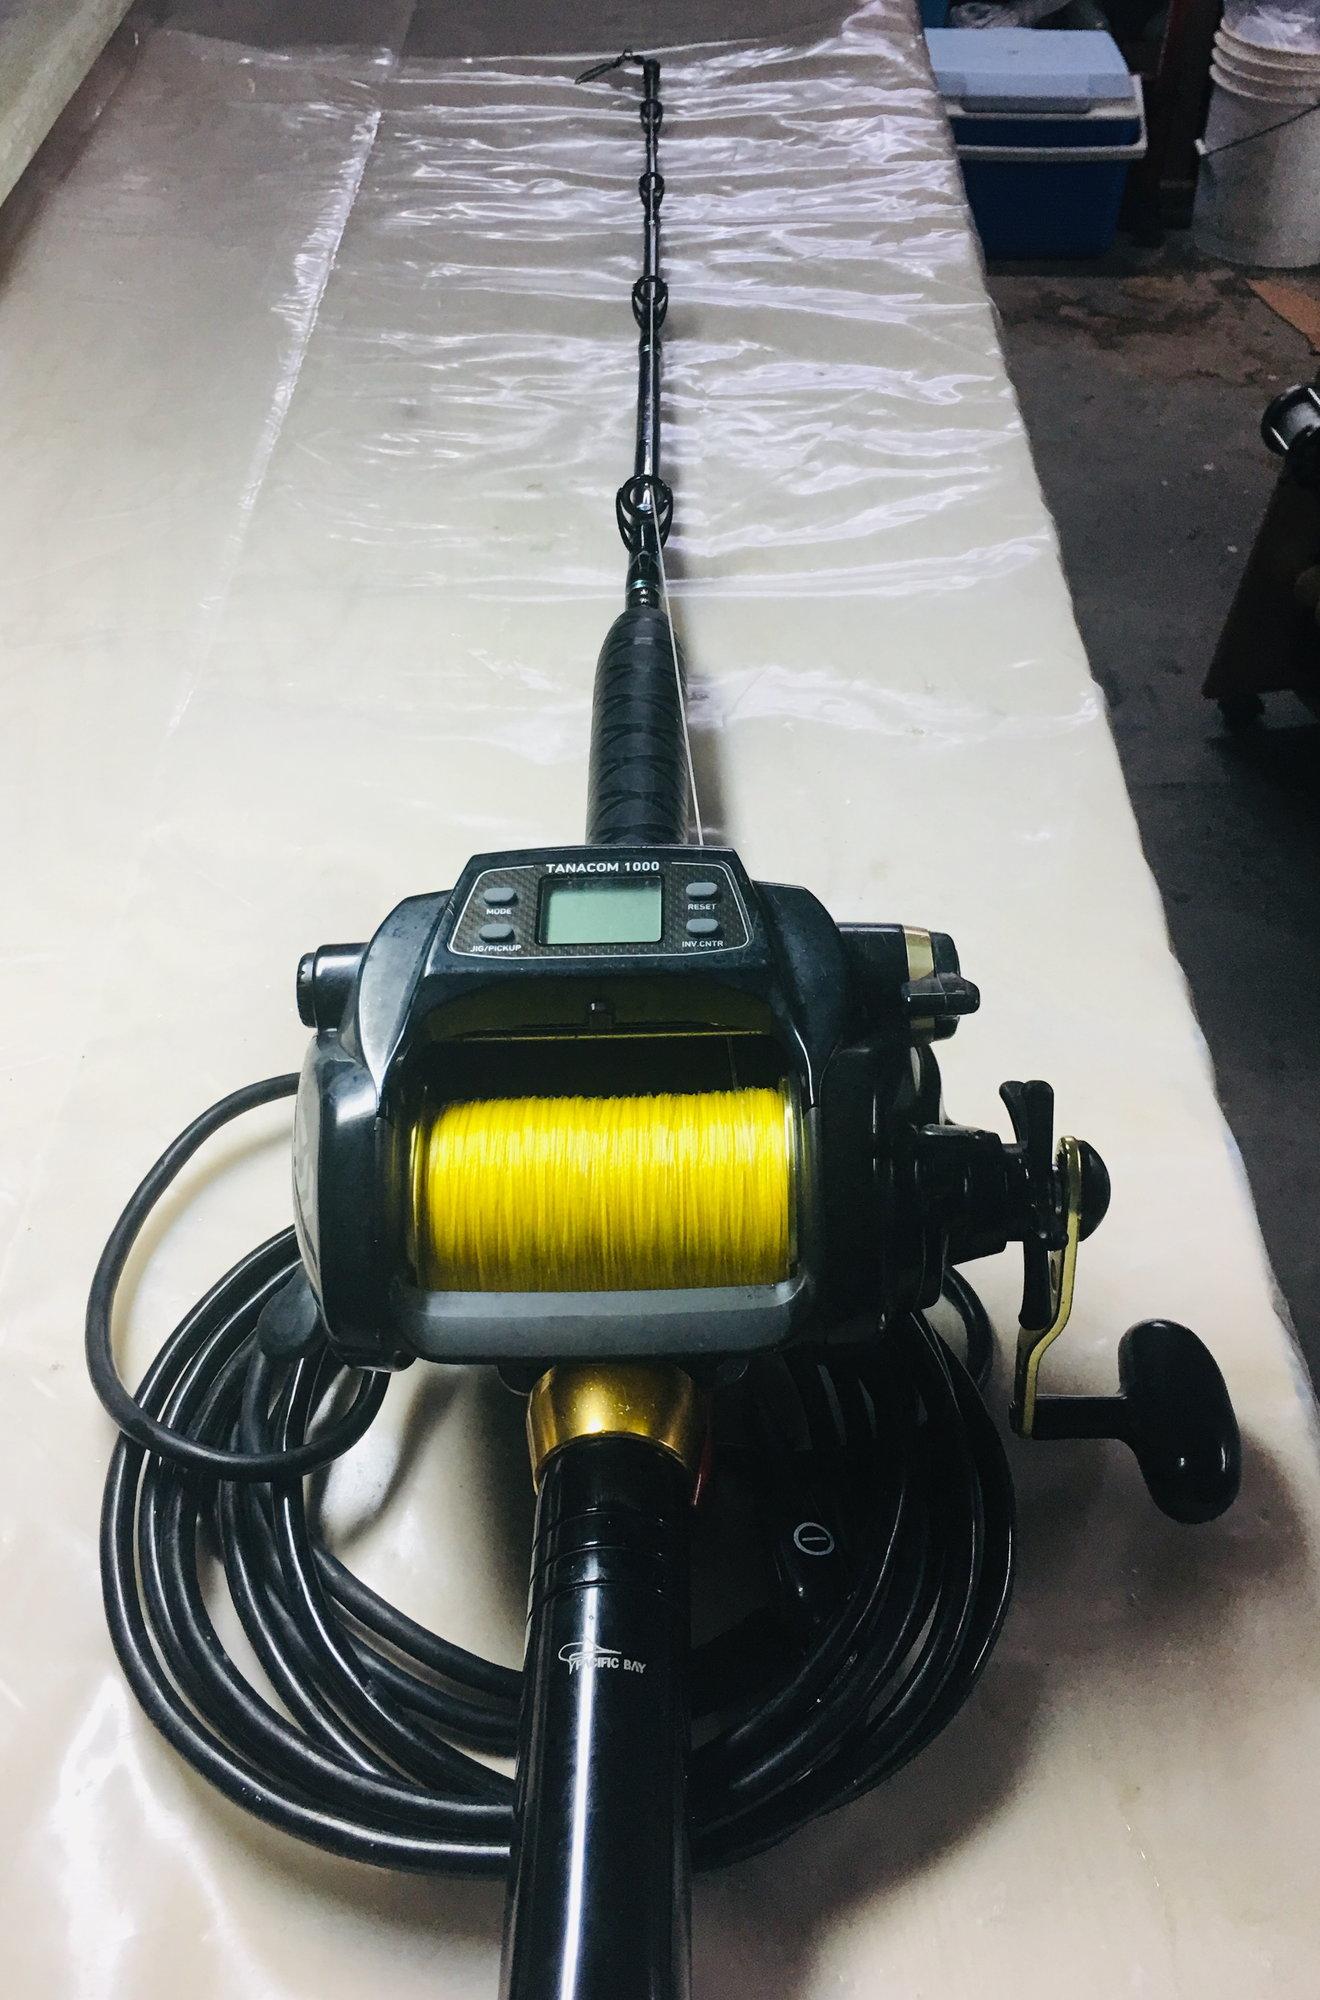 electric reel daiwa rod tanacom drop deep 1000 fishing